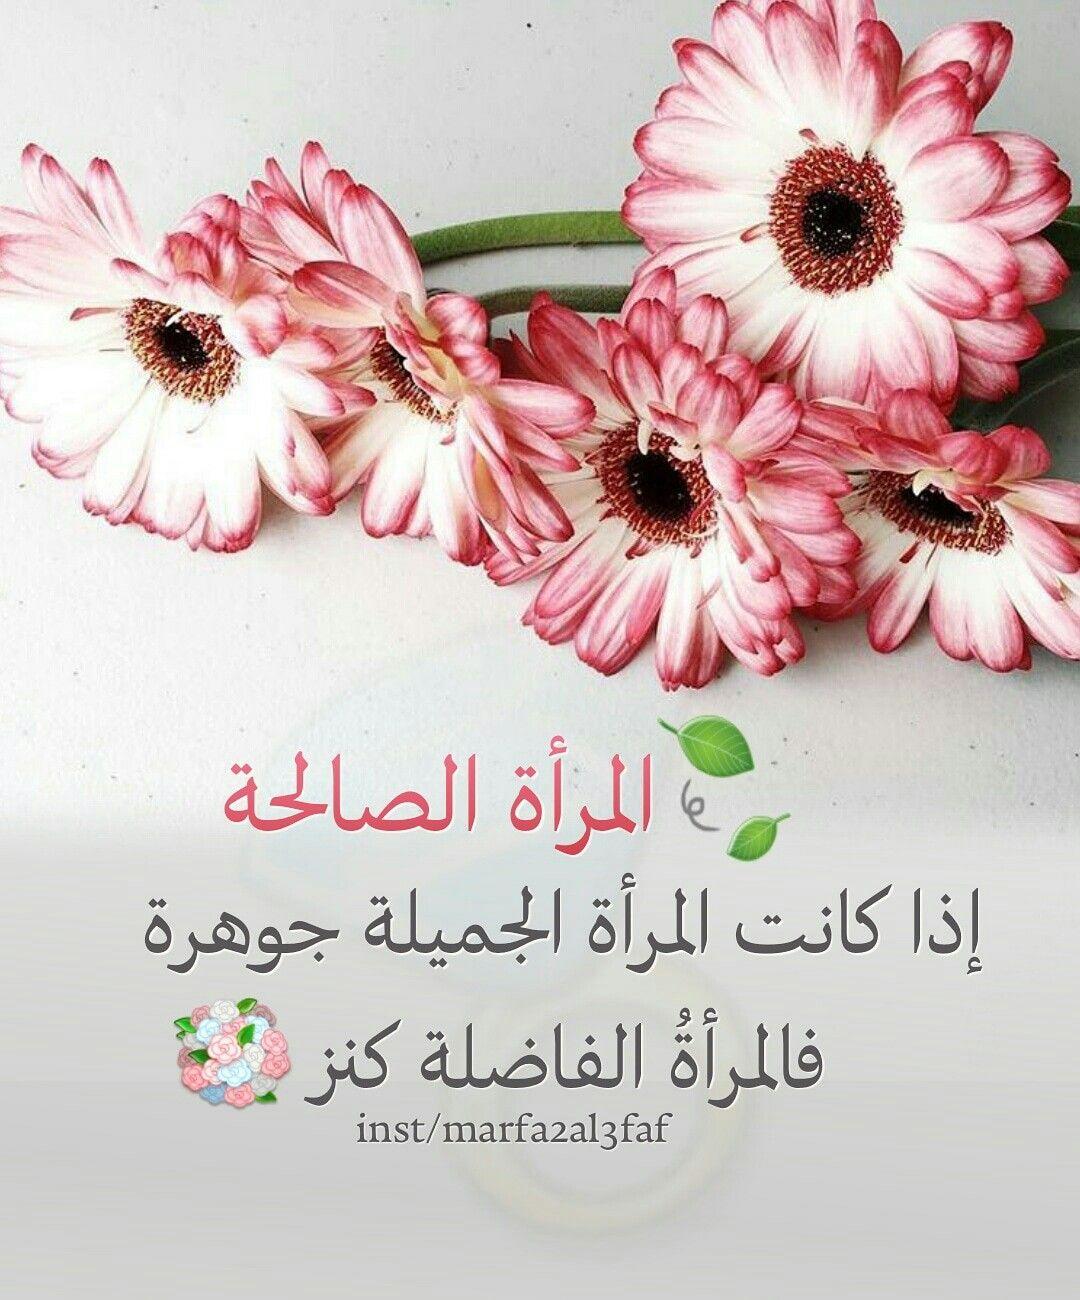 Pin By Um Ahmad On المرأة المسلمة والحجاب Place Card Holders Place Cards Card Holder